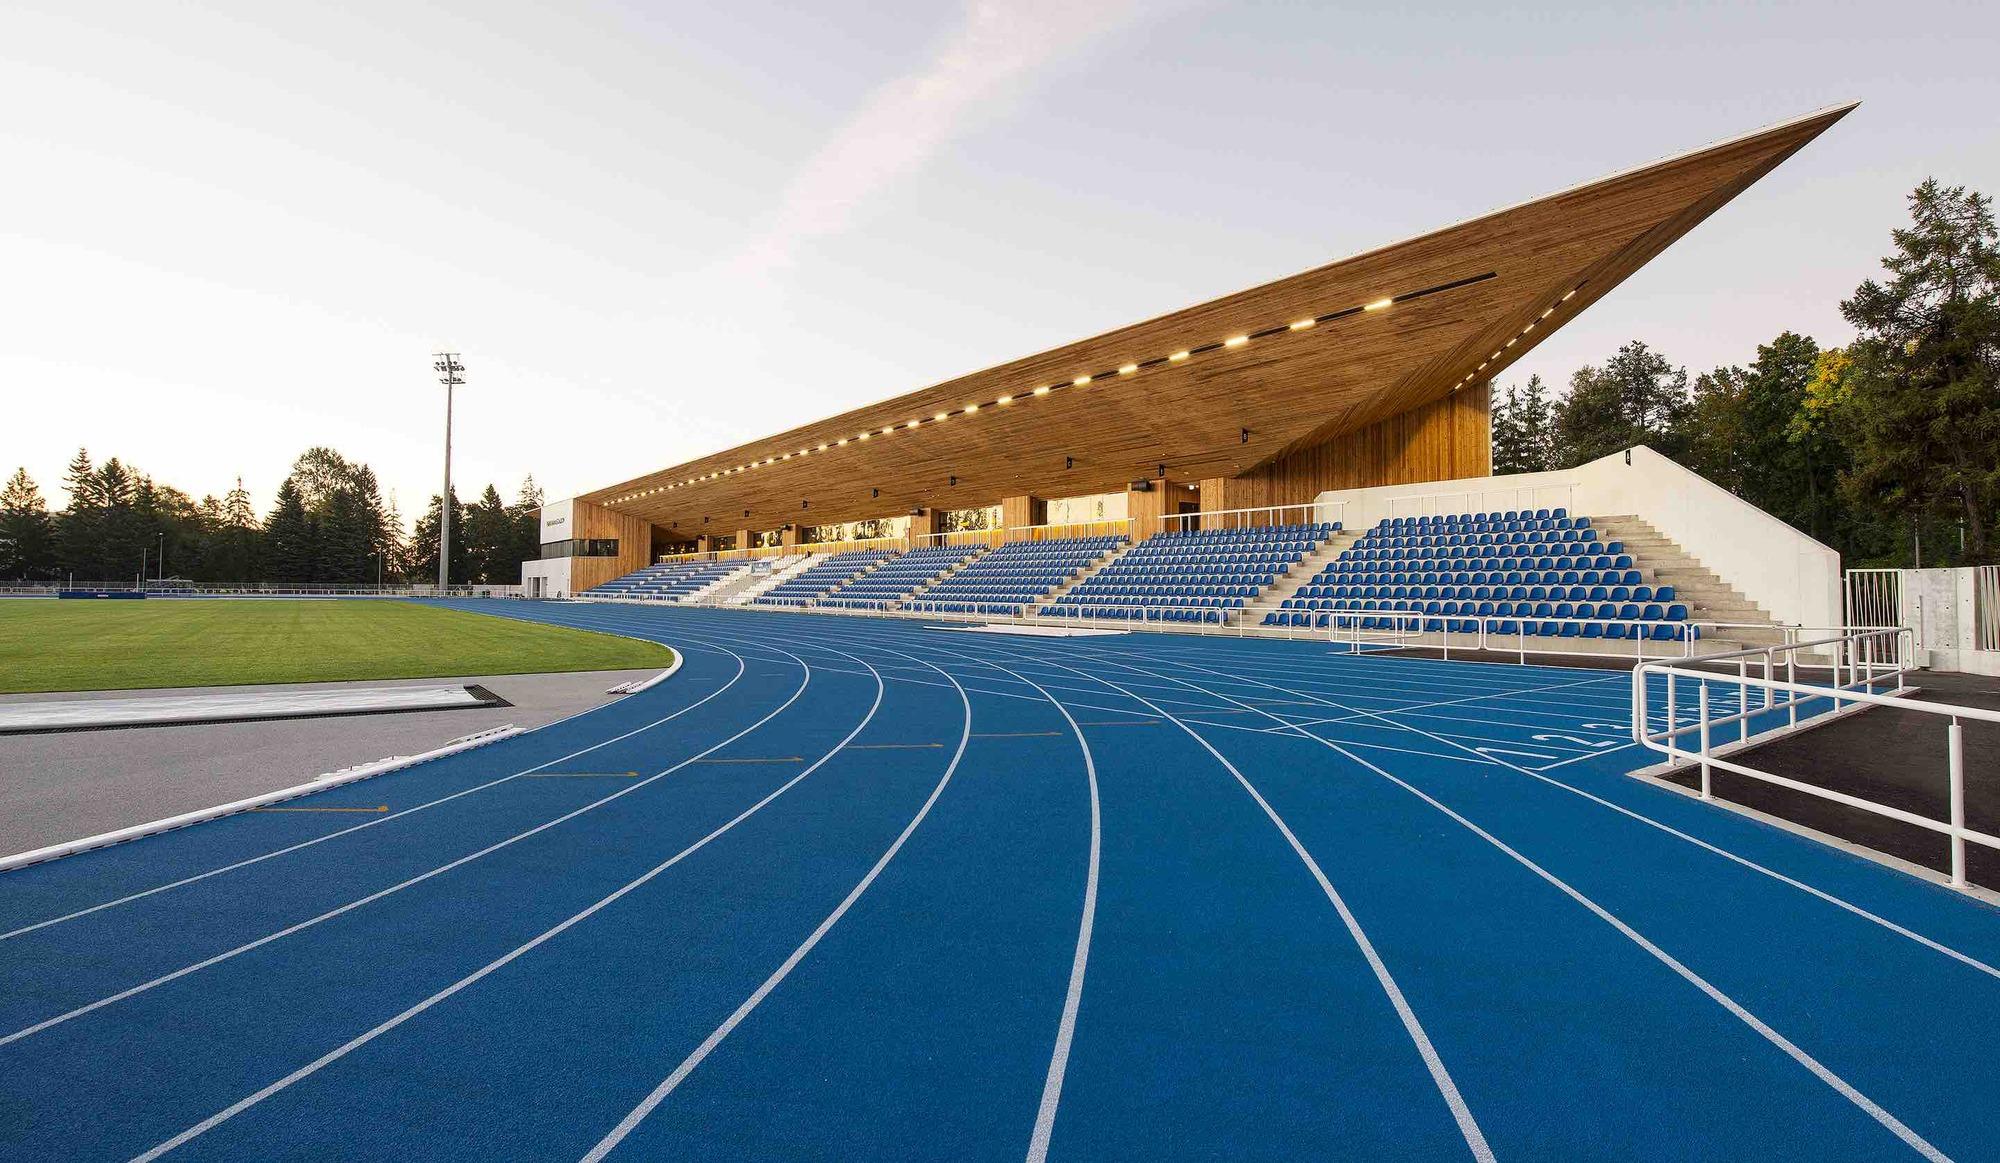 fbd61ca6da5 Pärnu Stadium / Kamp Arhitektid